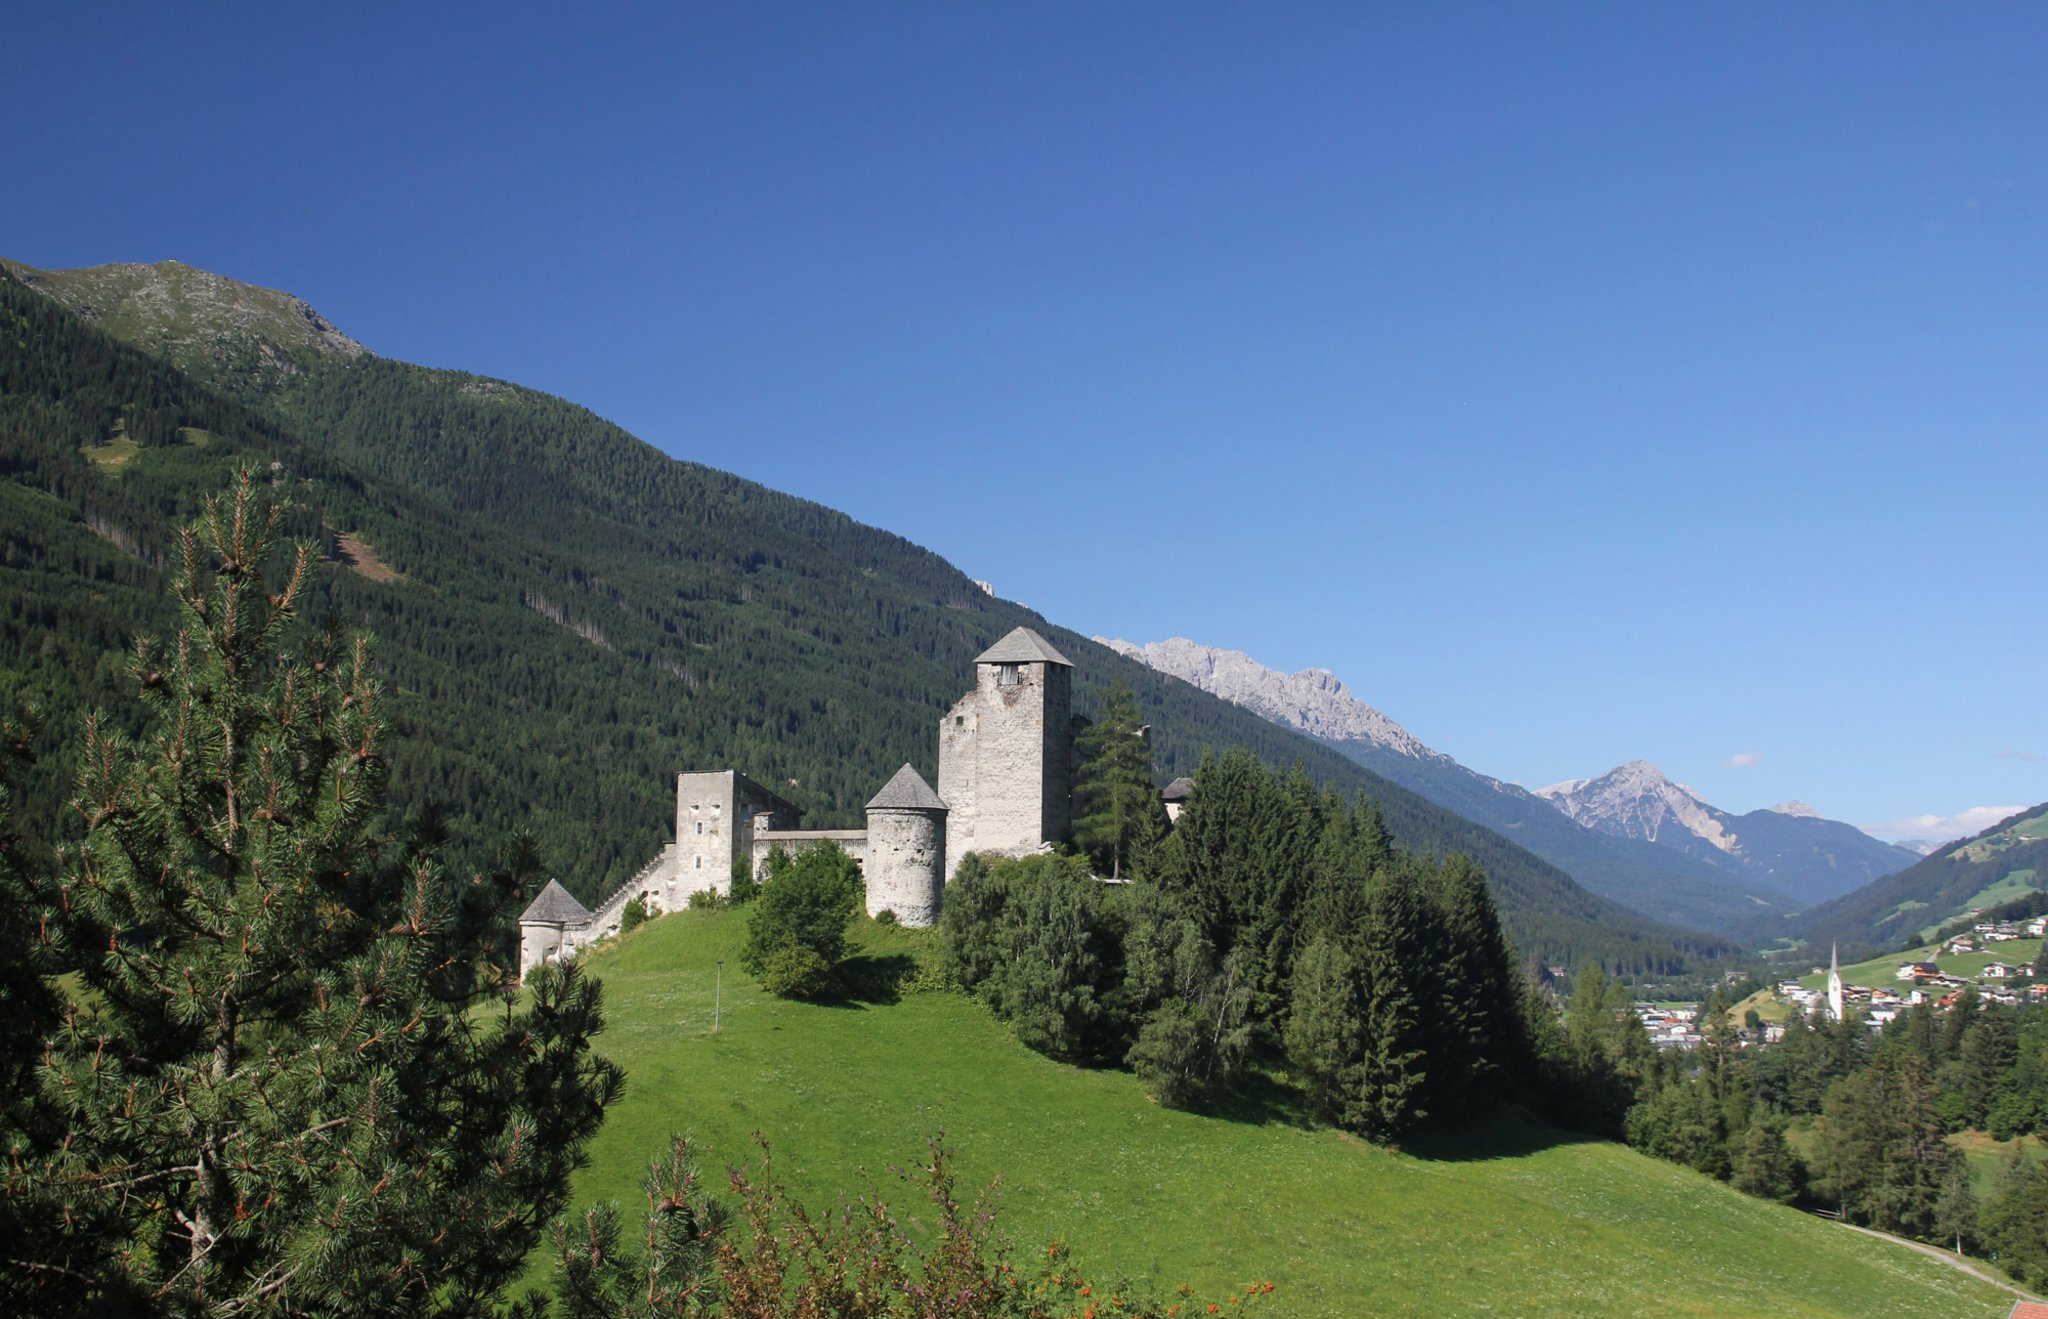 Die Burg Heinfels öffnet ihre Tore